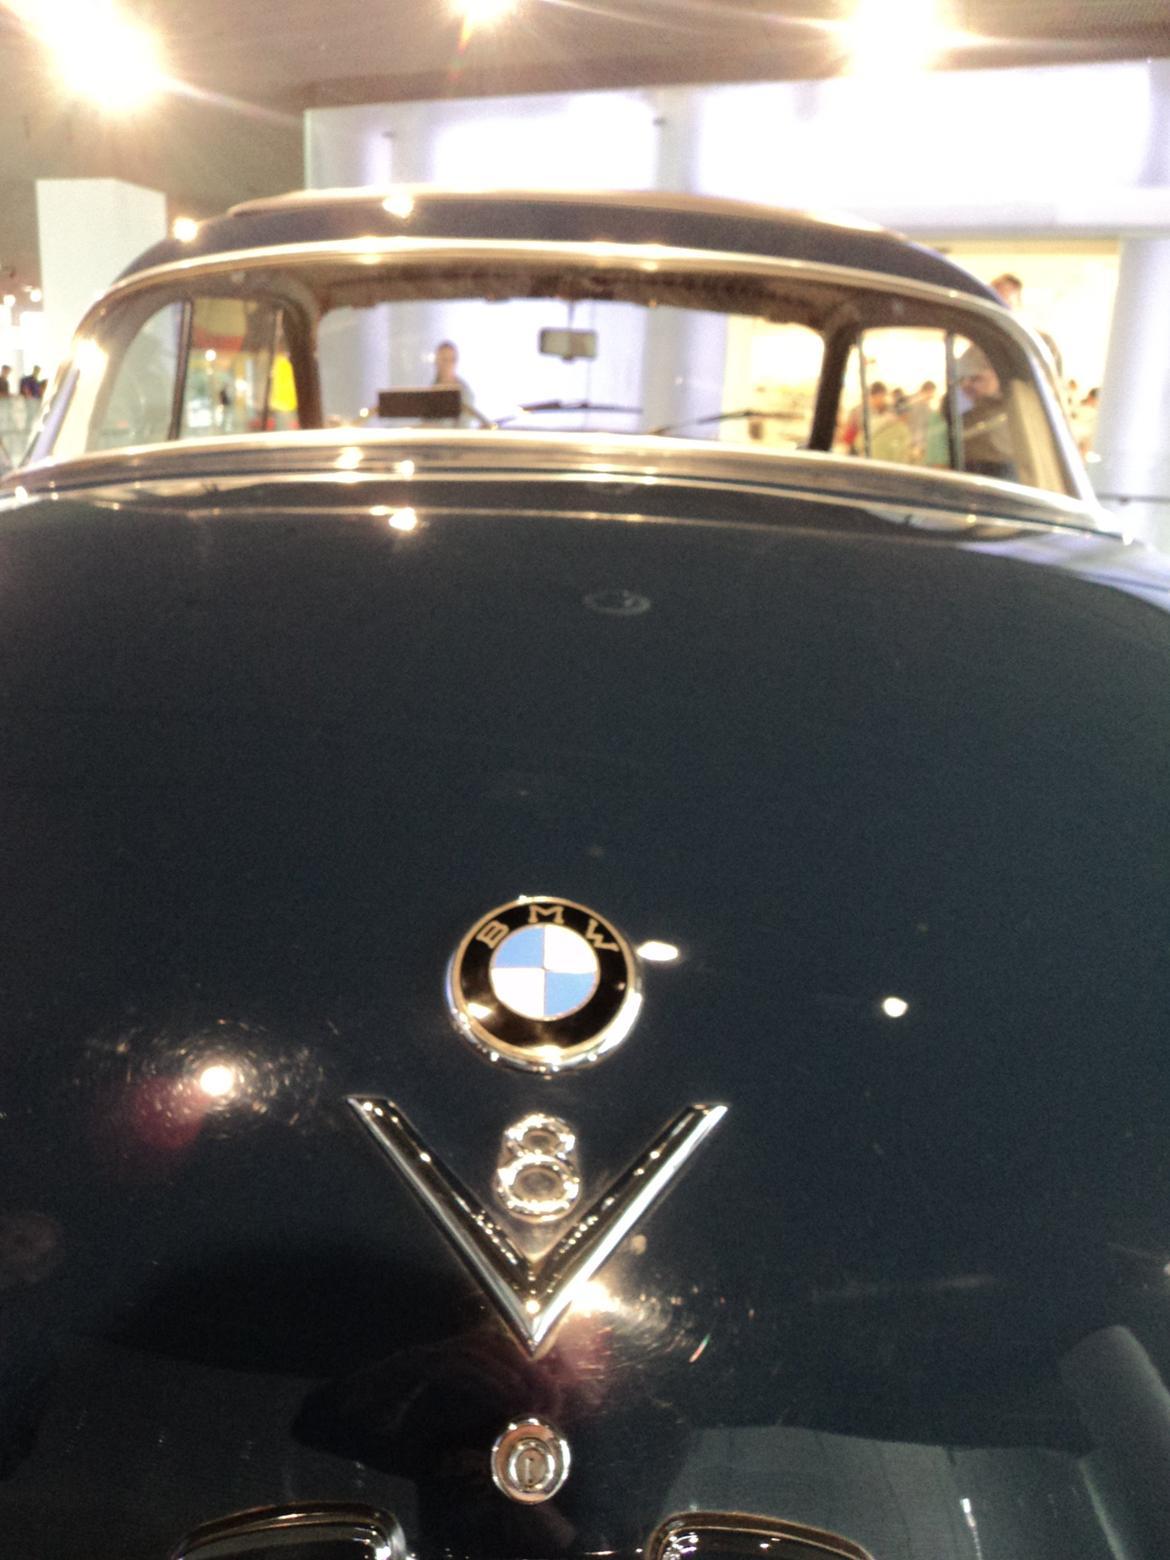 BMW Welt museum i München 2015 billede 36